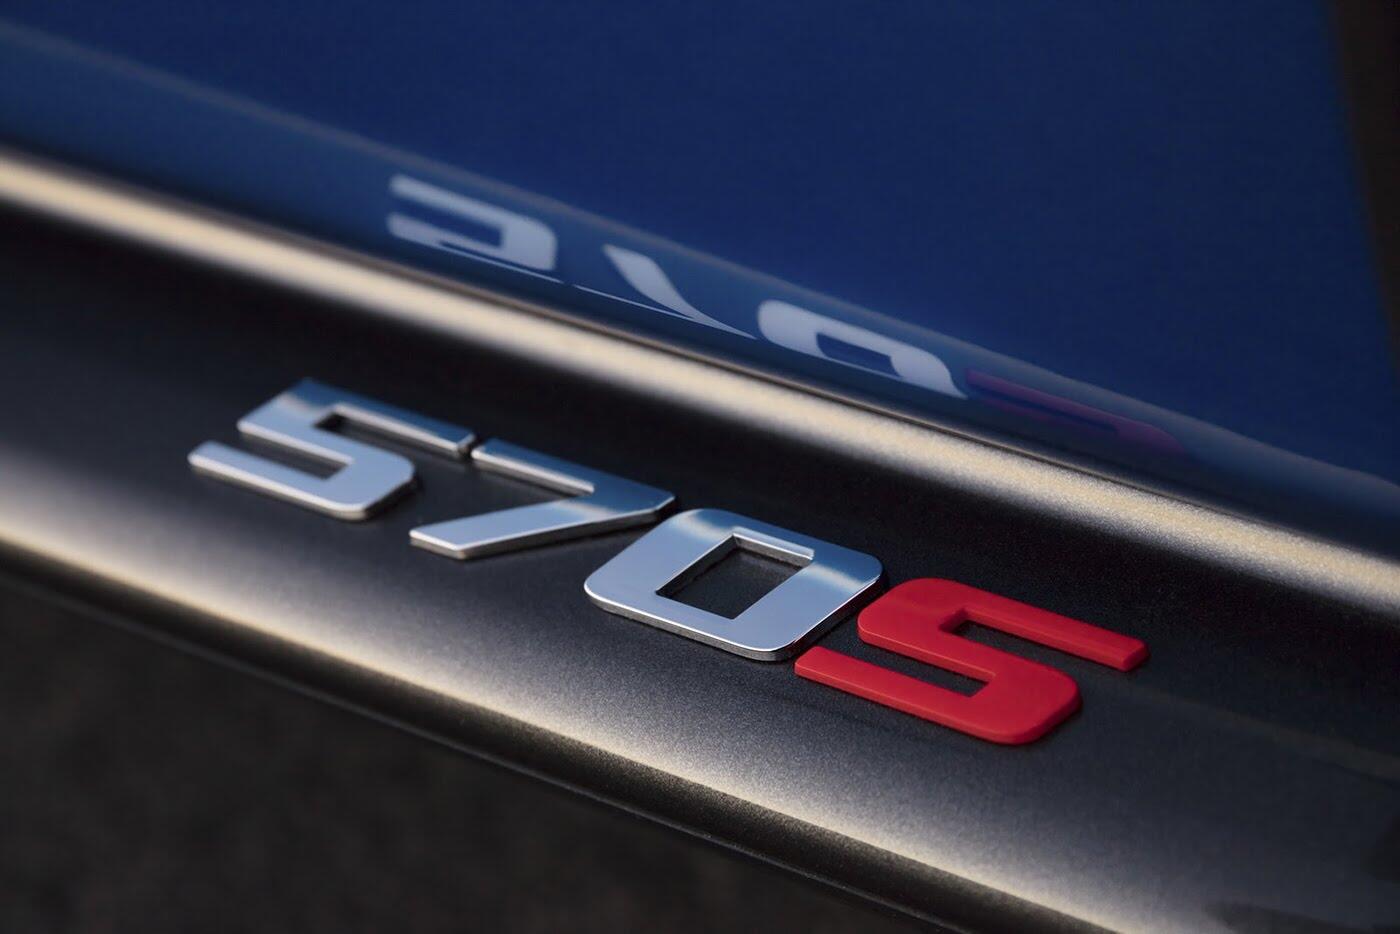 Siêu xe McLaren 570S Spider sắp ra mắt - Hình 5